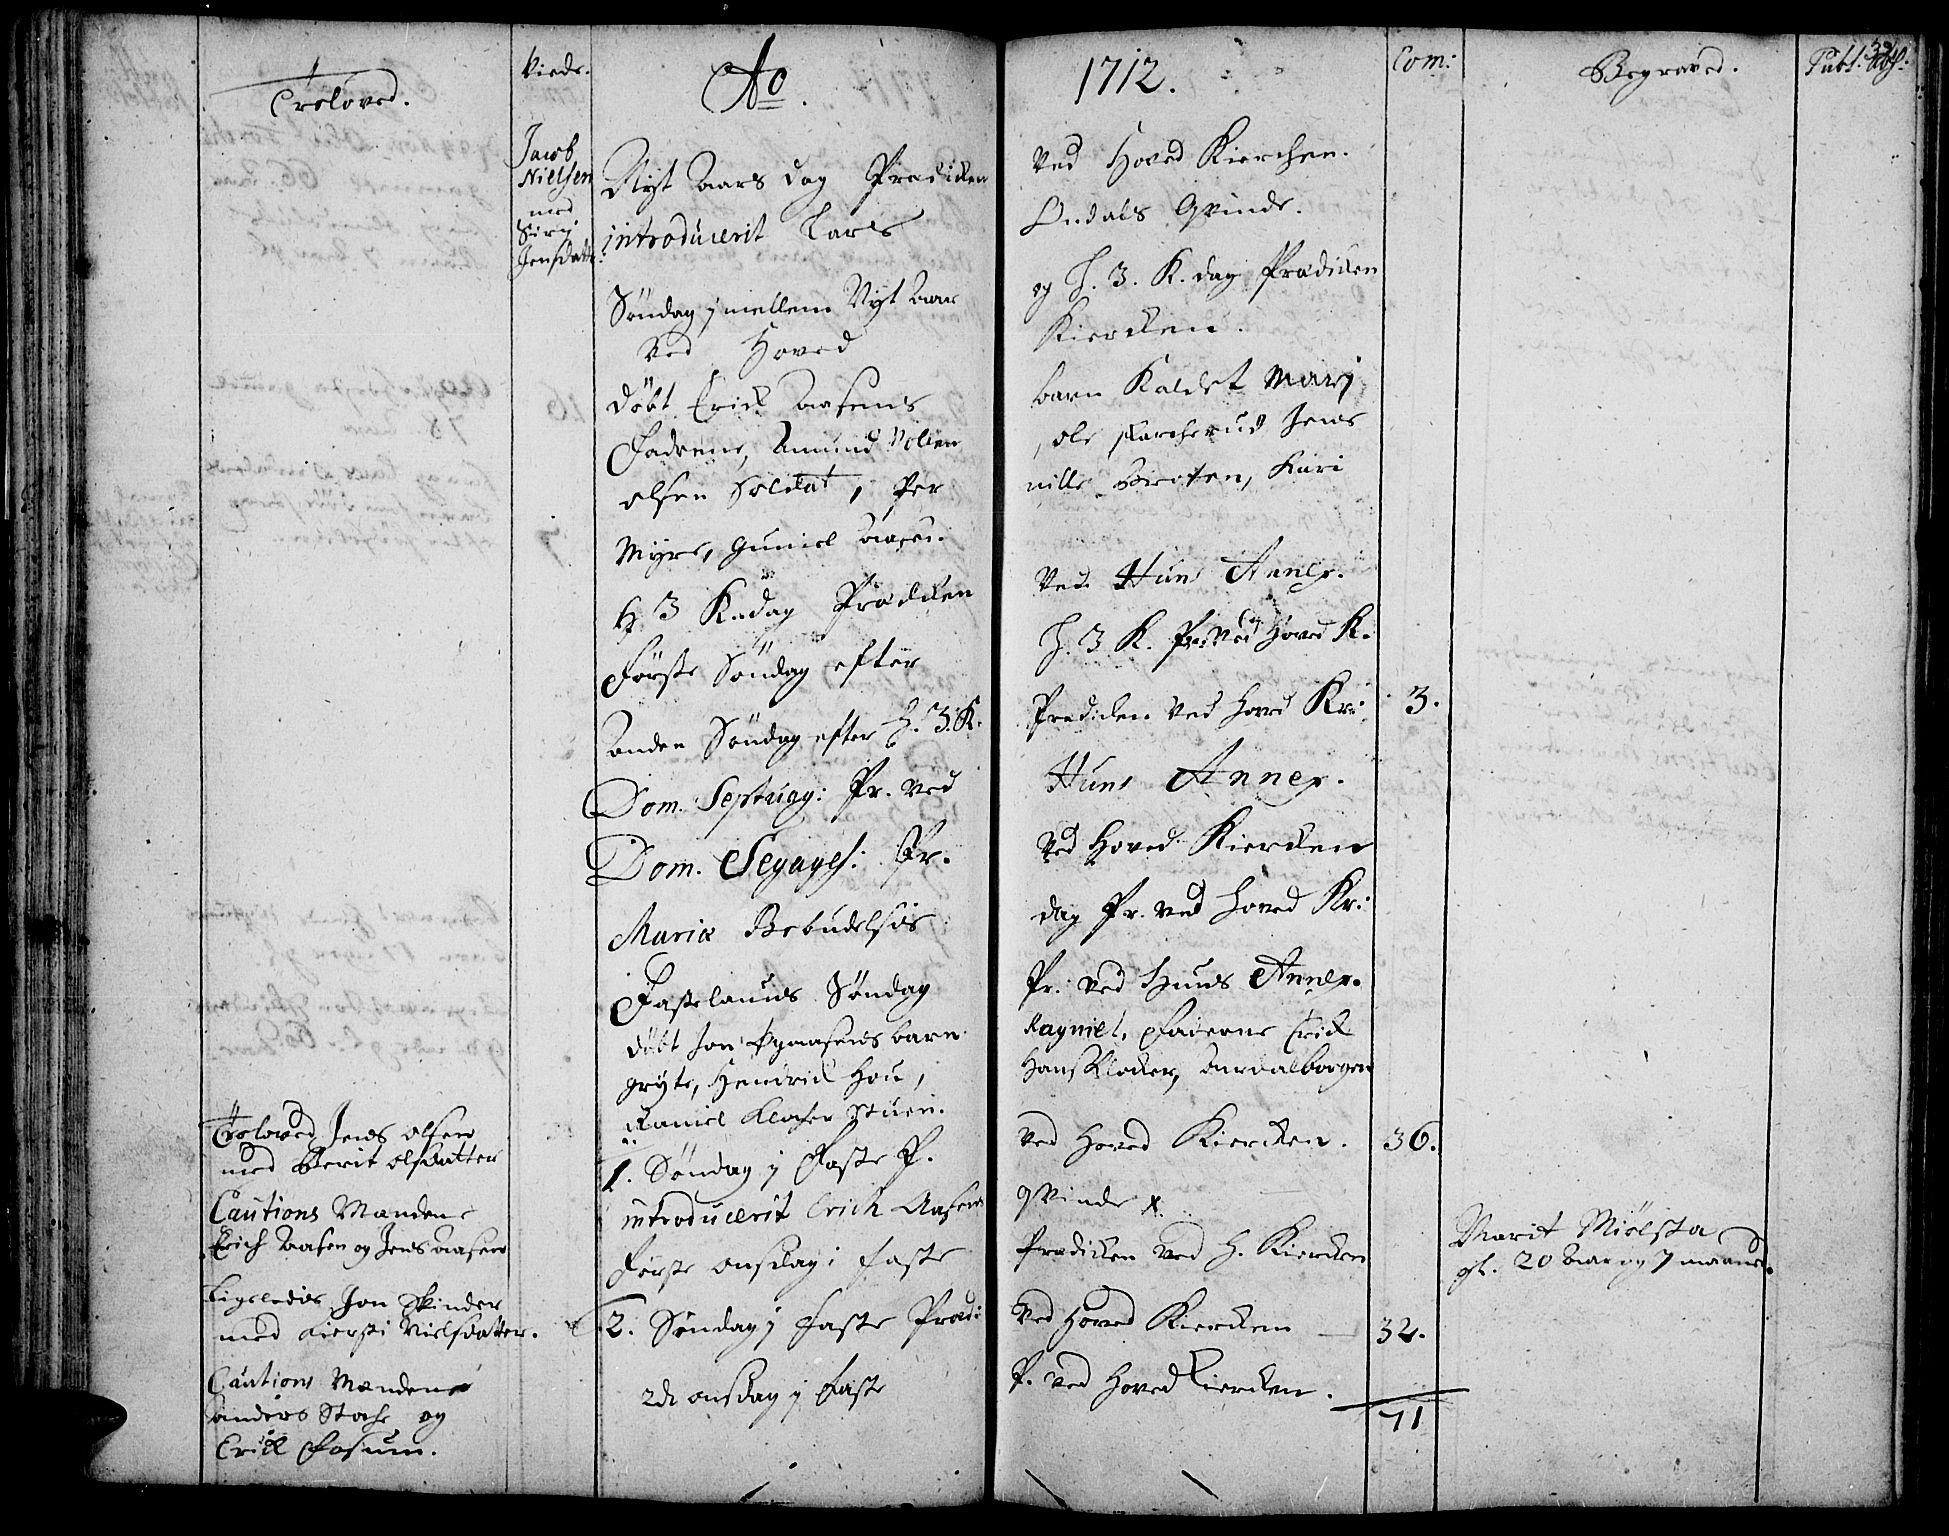 SAH, Vardal prestekontor, H/Ha/Haa/L0001: Ministerialbok nr. 1, 1706-1748, s. 32